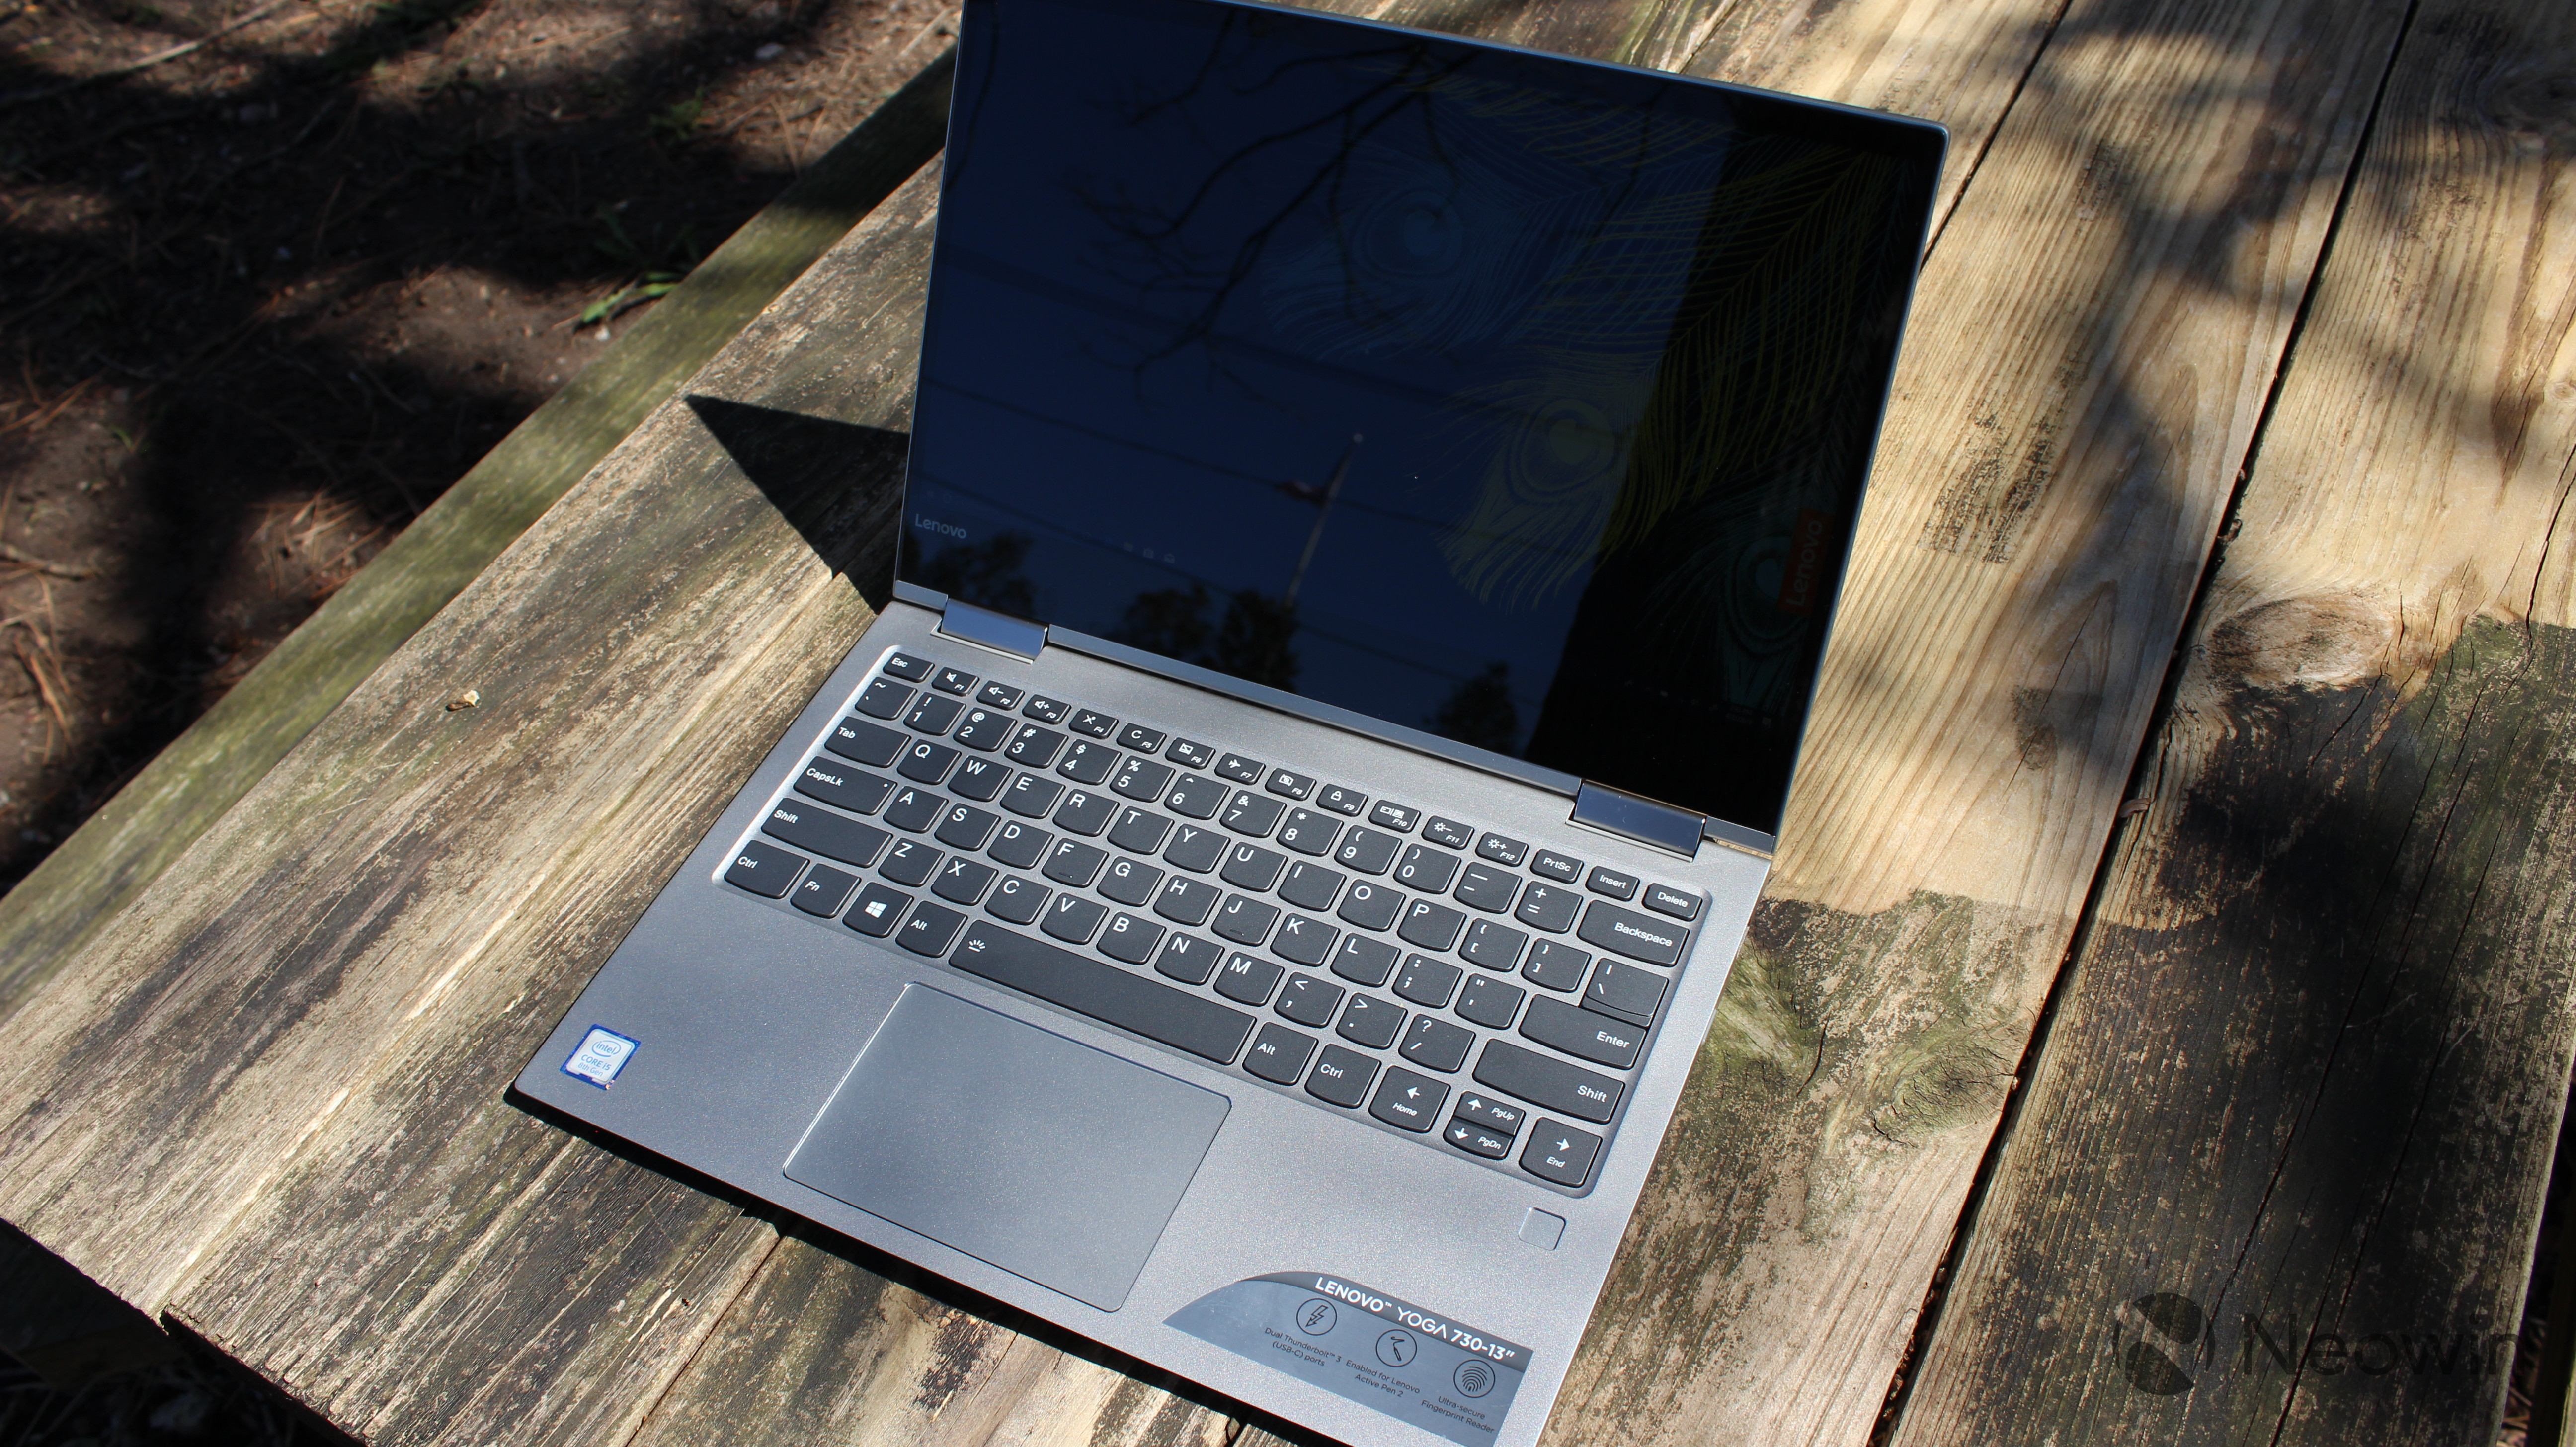 Lenovo Yoga 730 13 review - The mid-range looks pretty good - Neowin